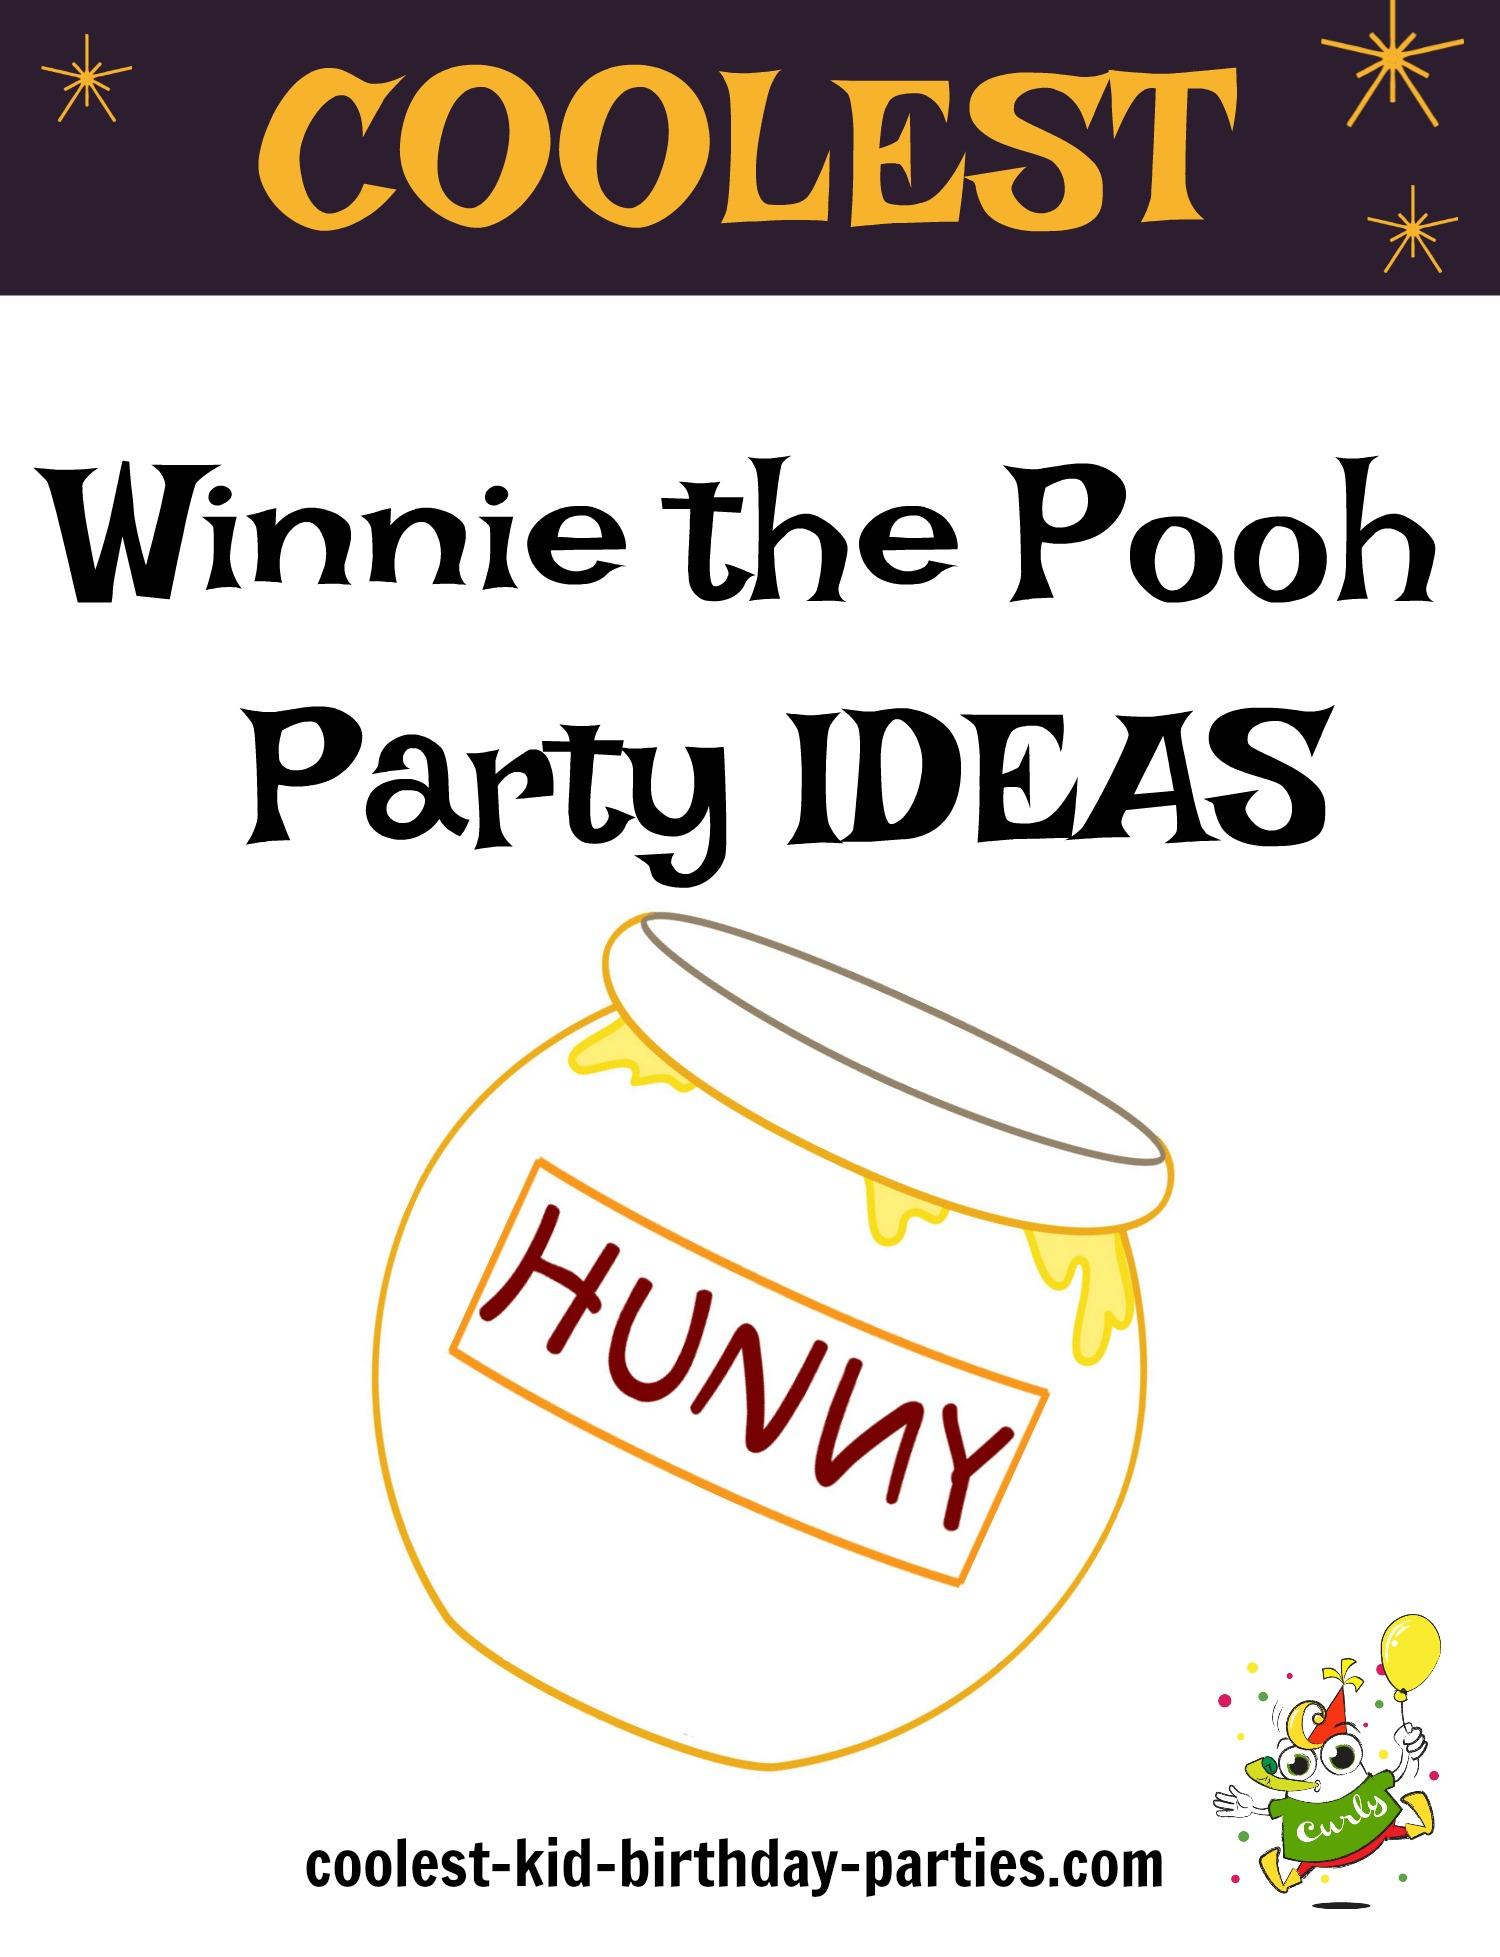 Coolest Winnie the Pooh Birthday Ideas